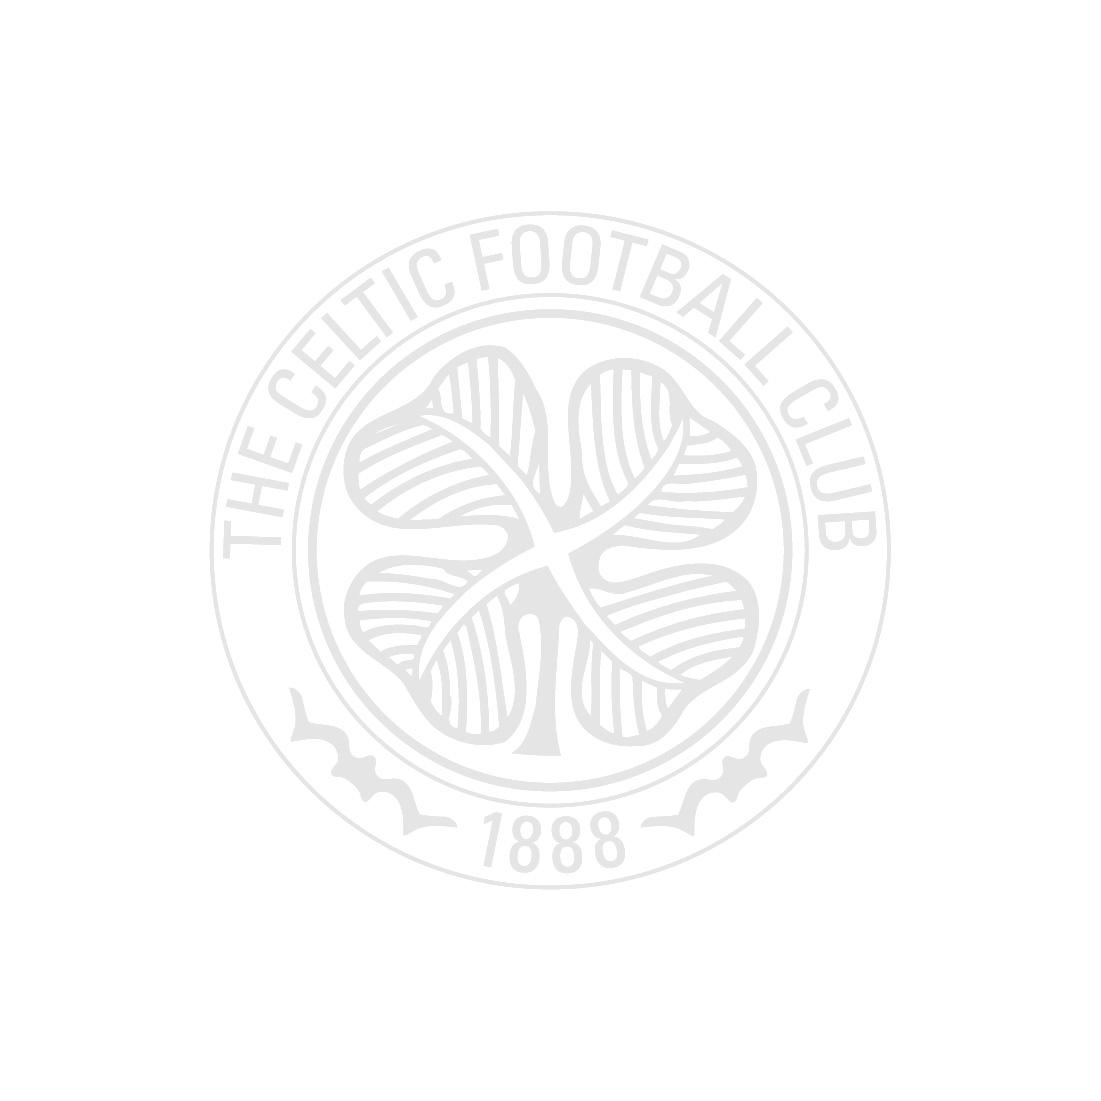 Celtic Mesh Effect 88 Graphic T-shirt